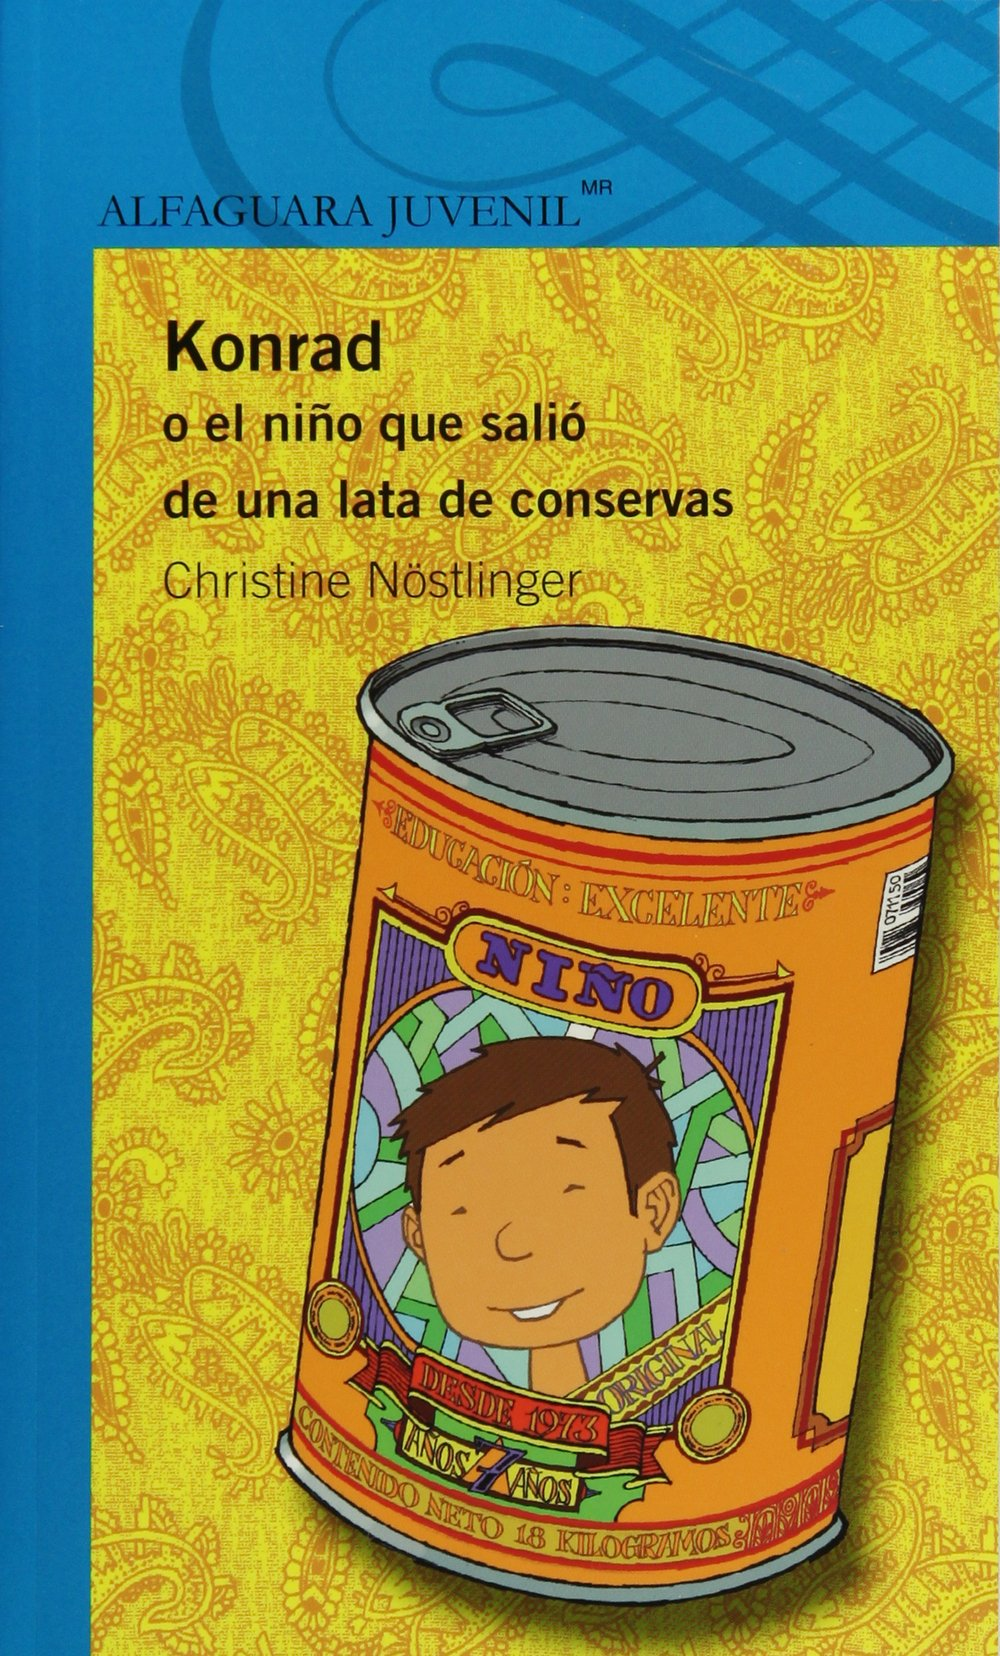 Amazon.com: Konrad o el niño que salio de una lata (Alfaguara Juvenil) (Spanish Edition) (9786070118937): Christine Nöstlinger, Ricardo Pélaez: Books